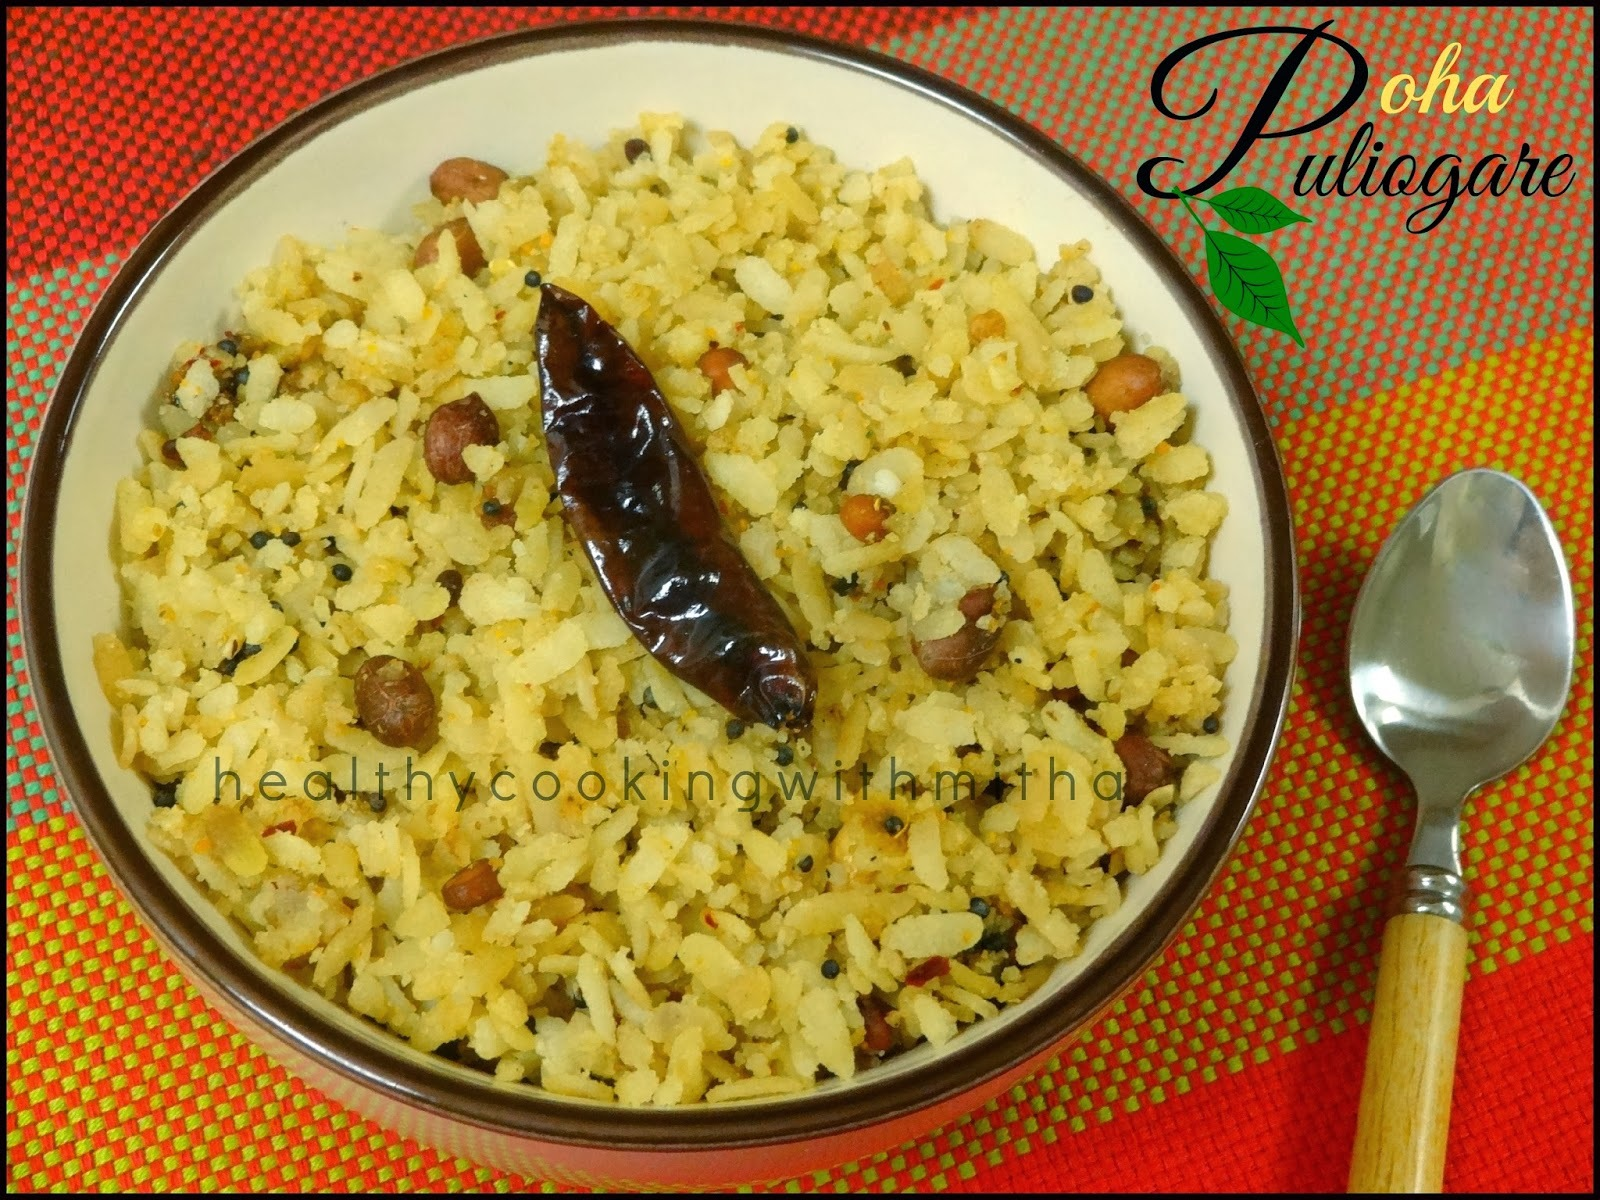 Poha Puliogare | Tamarind Poha | Gojjavalakki |  Puli Aval